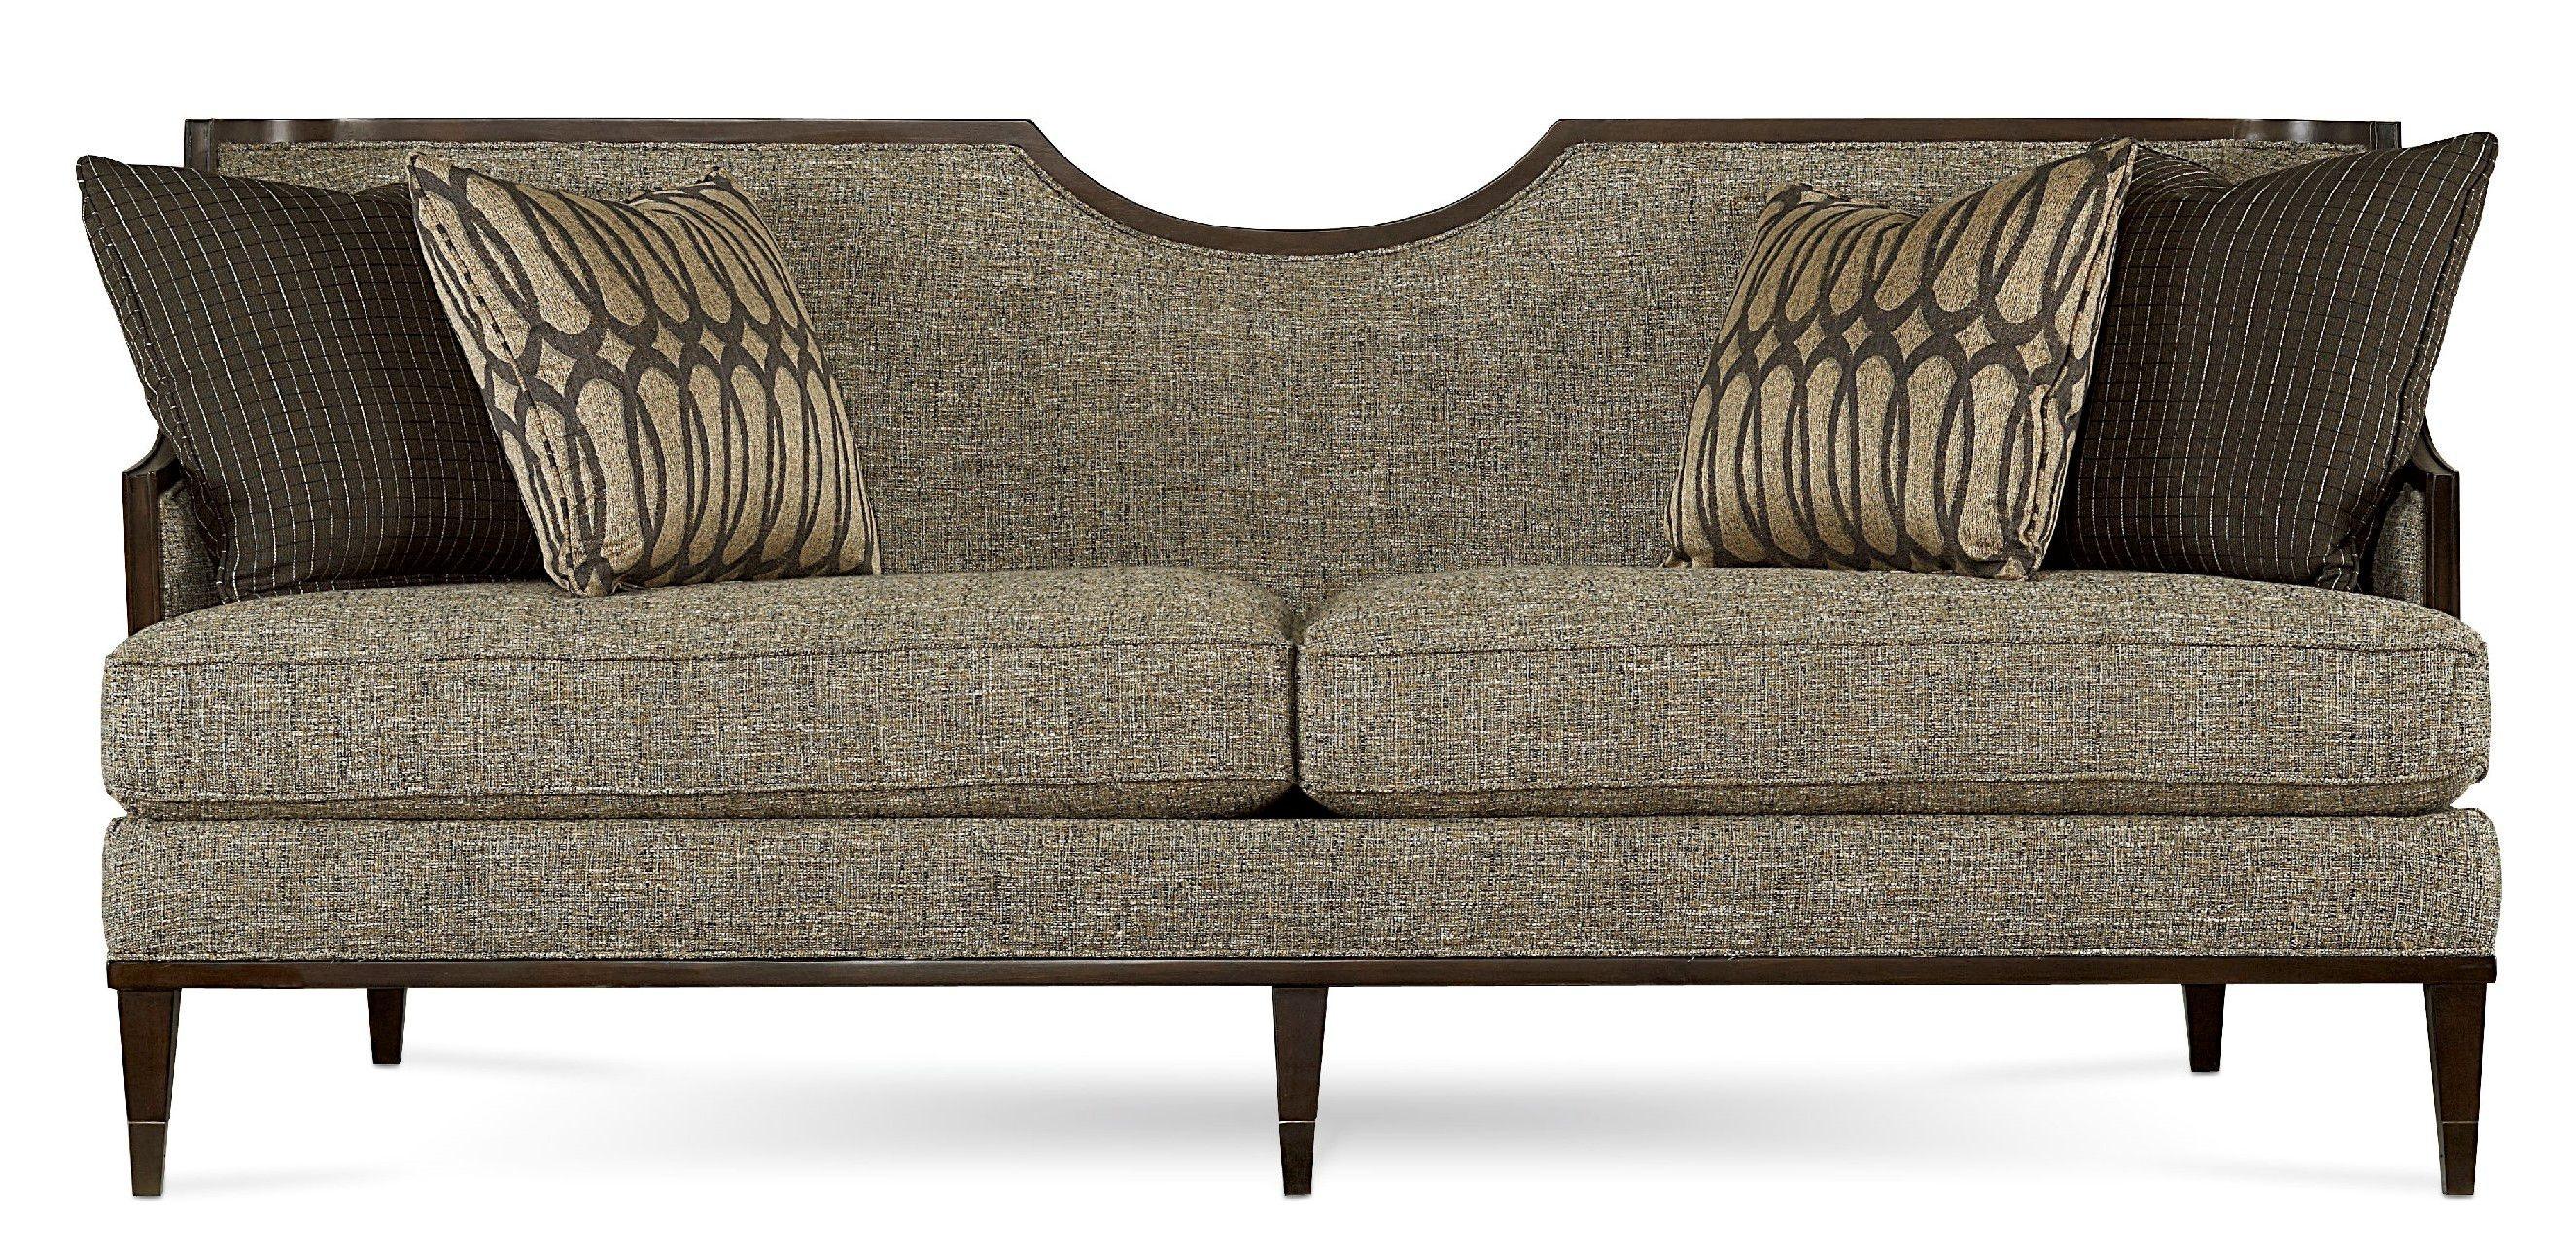 161501 5036AA. Sofa · Carol House Discount Price $1,347.00